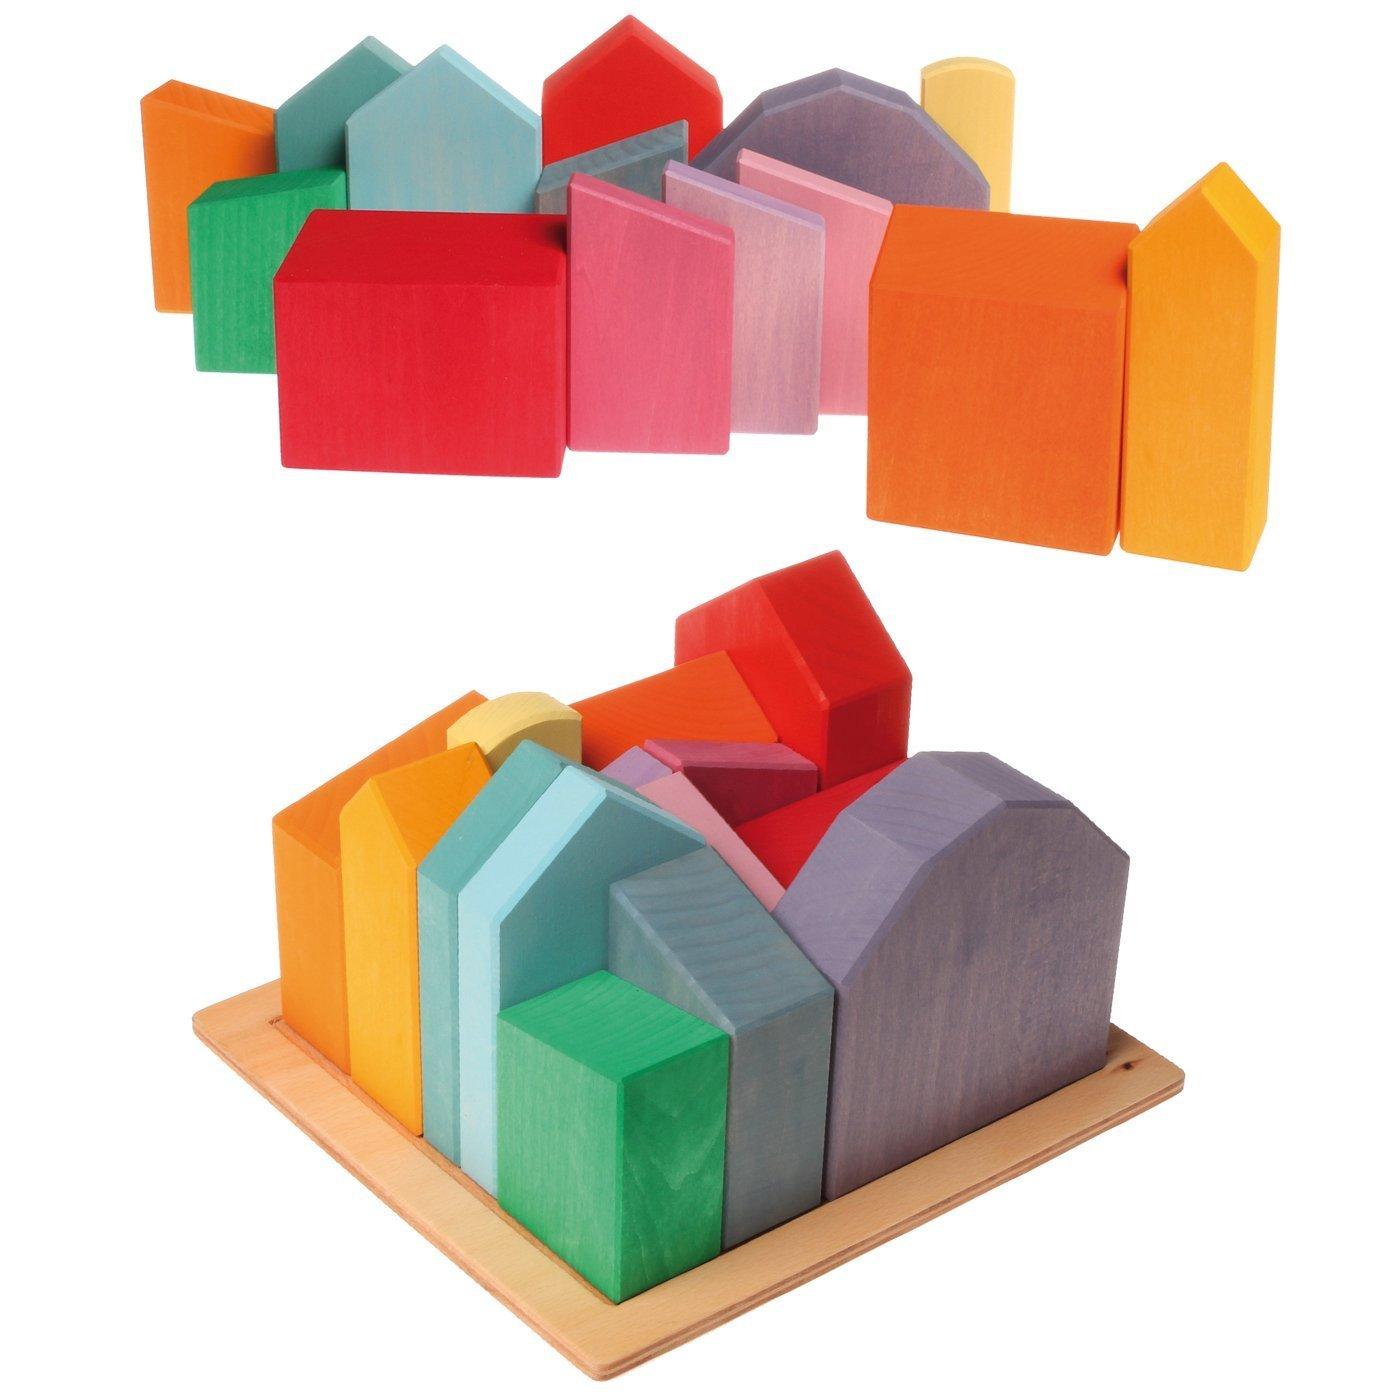 Grimm's Wooden City & Town Waldorf Building Blocks Set, Village of Large Houses